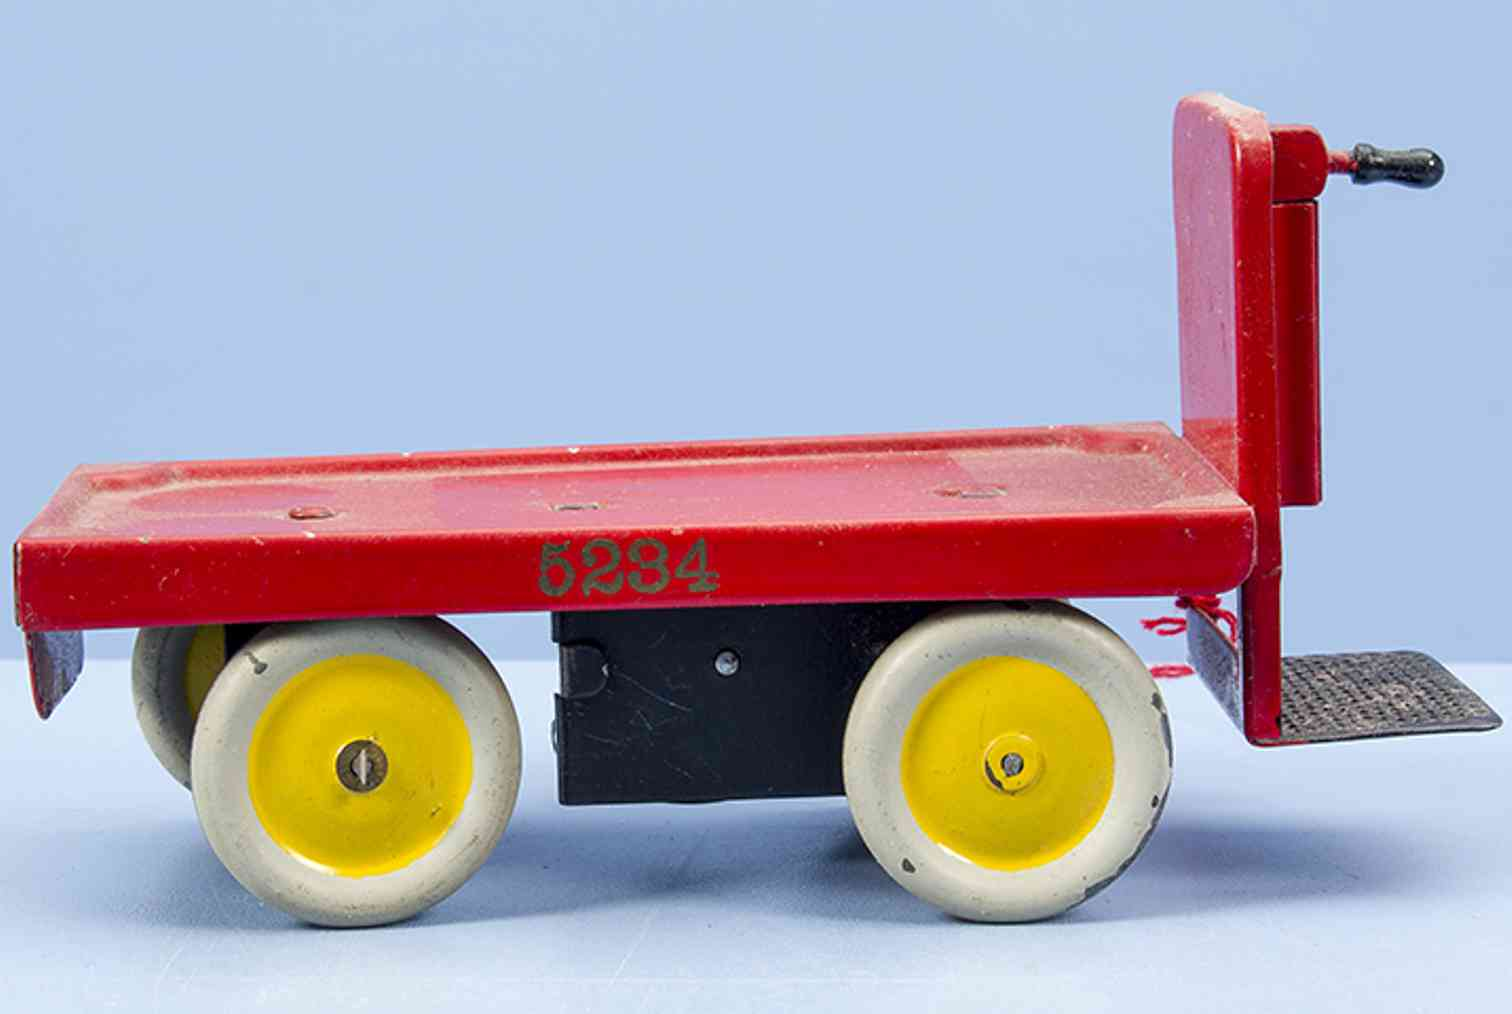 marklin maerklin 5234 railway toy electric trolley #5234 with clockwork drive, made of sheet m